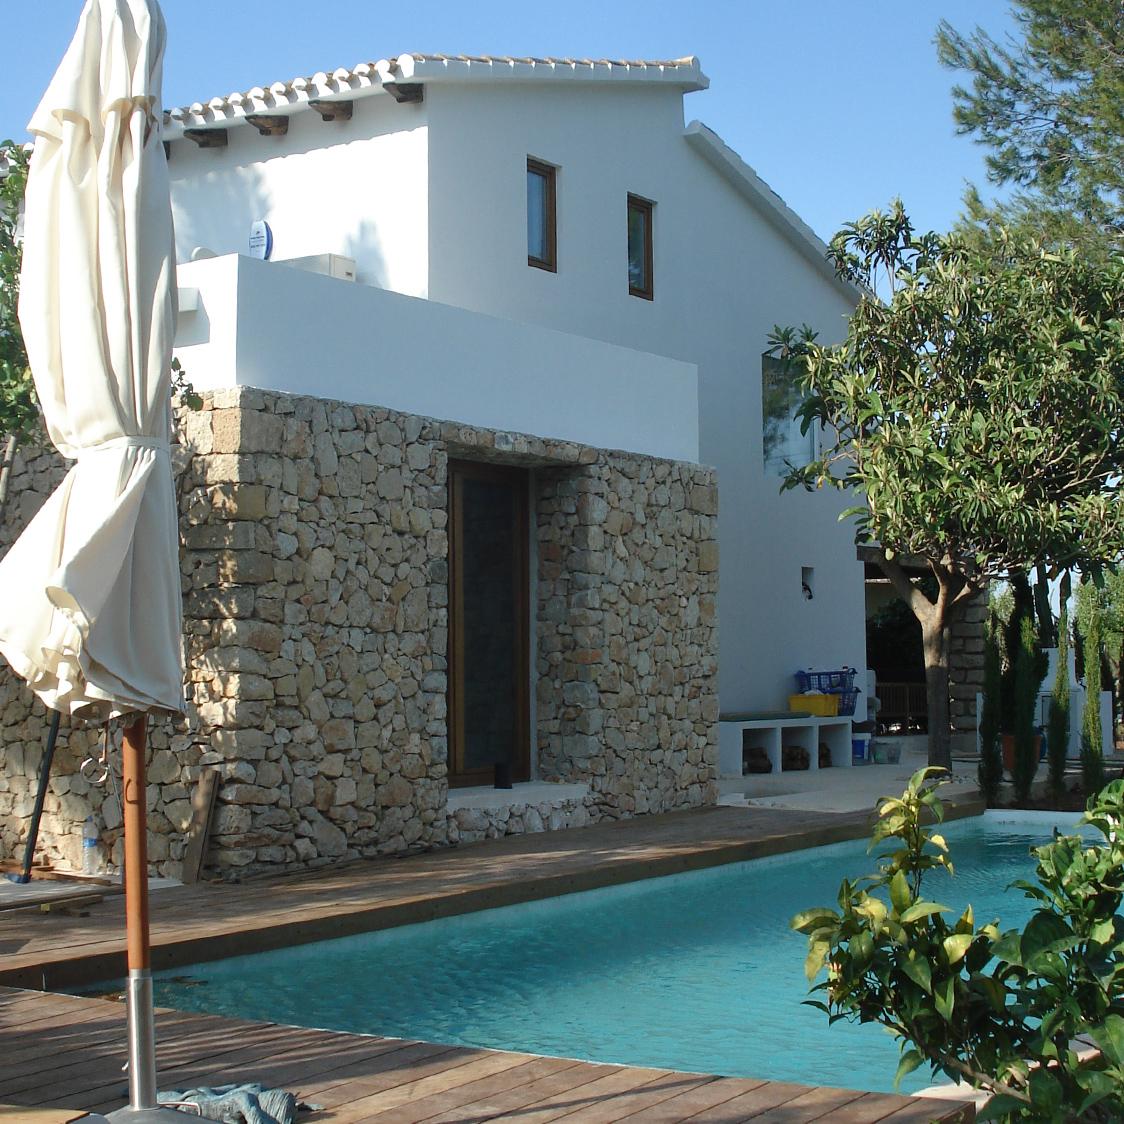 Casa de campo tradicional mediterránea